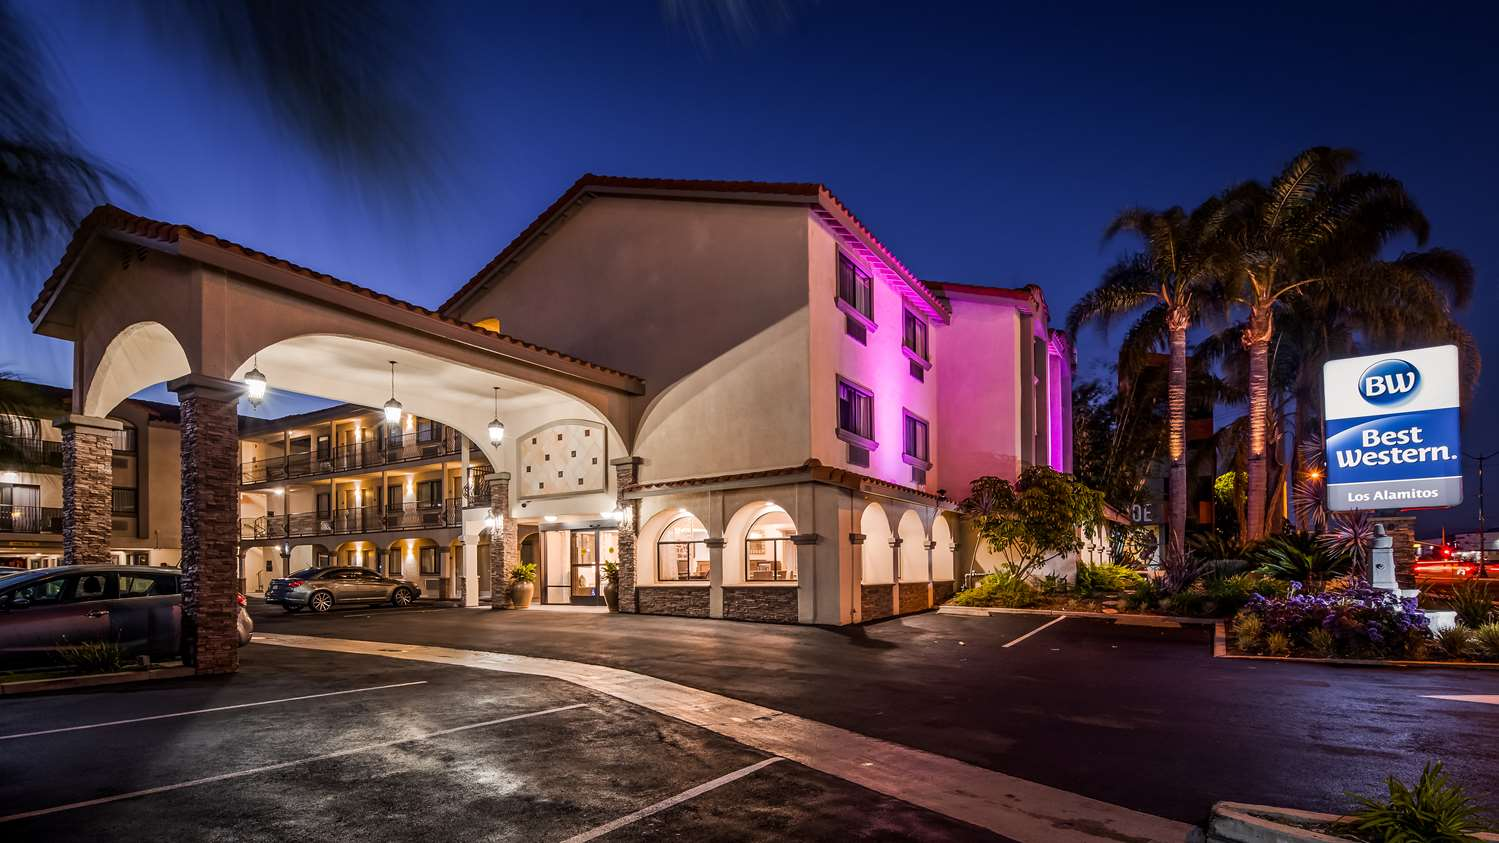 Exterior view - Best Western Los Alamitos Inn & Suites